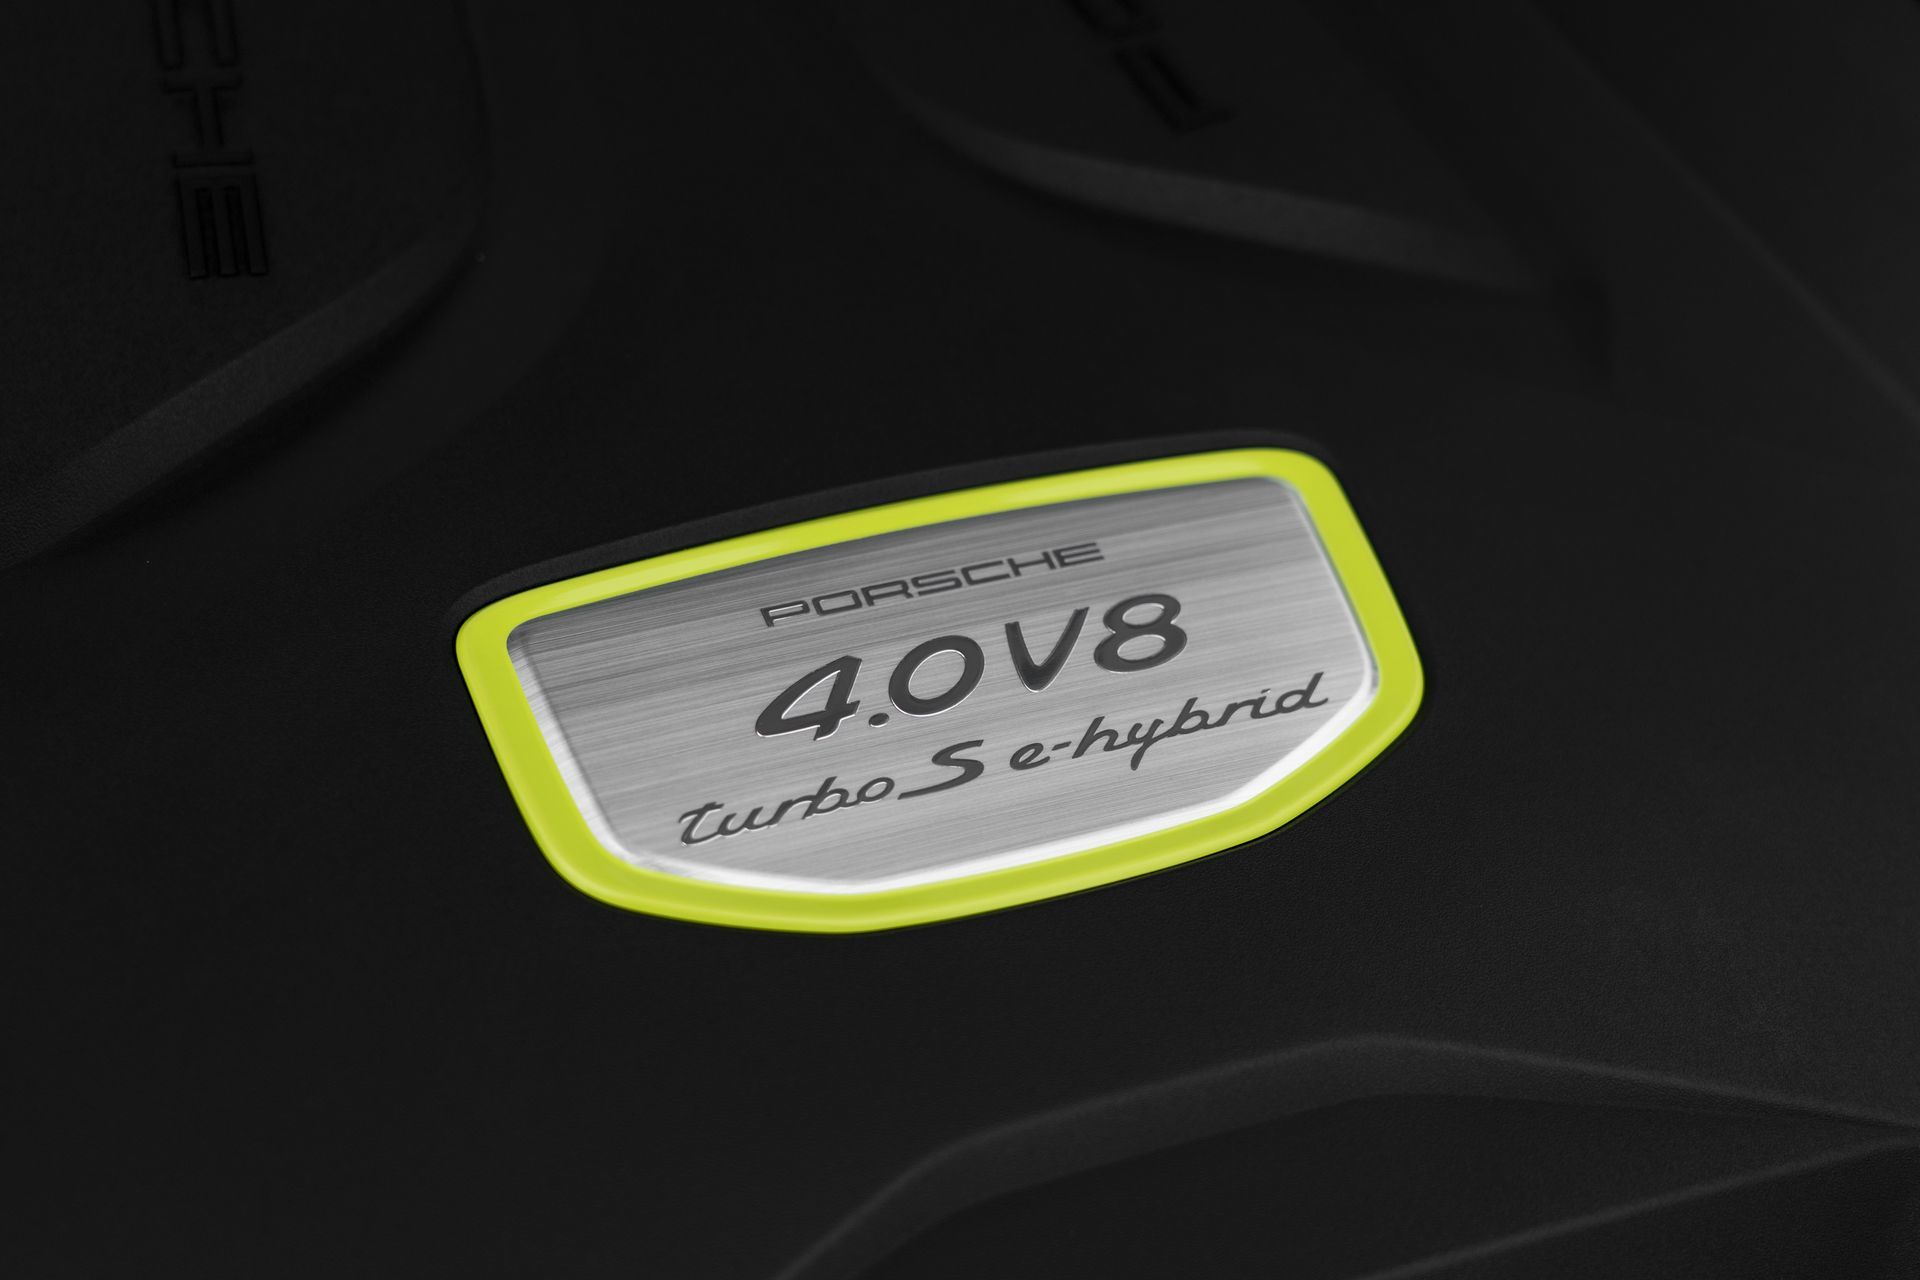 Prueba Porsche Cayenne Turbo S E Hybrid 35